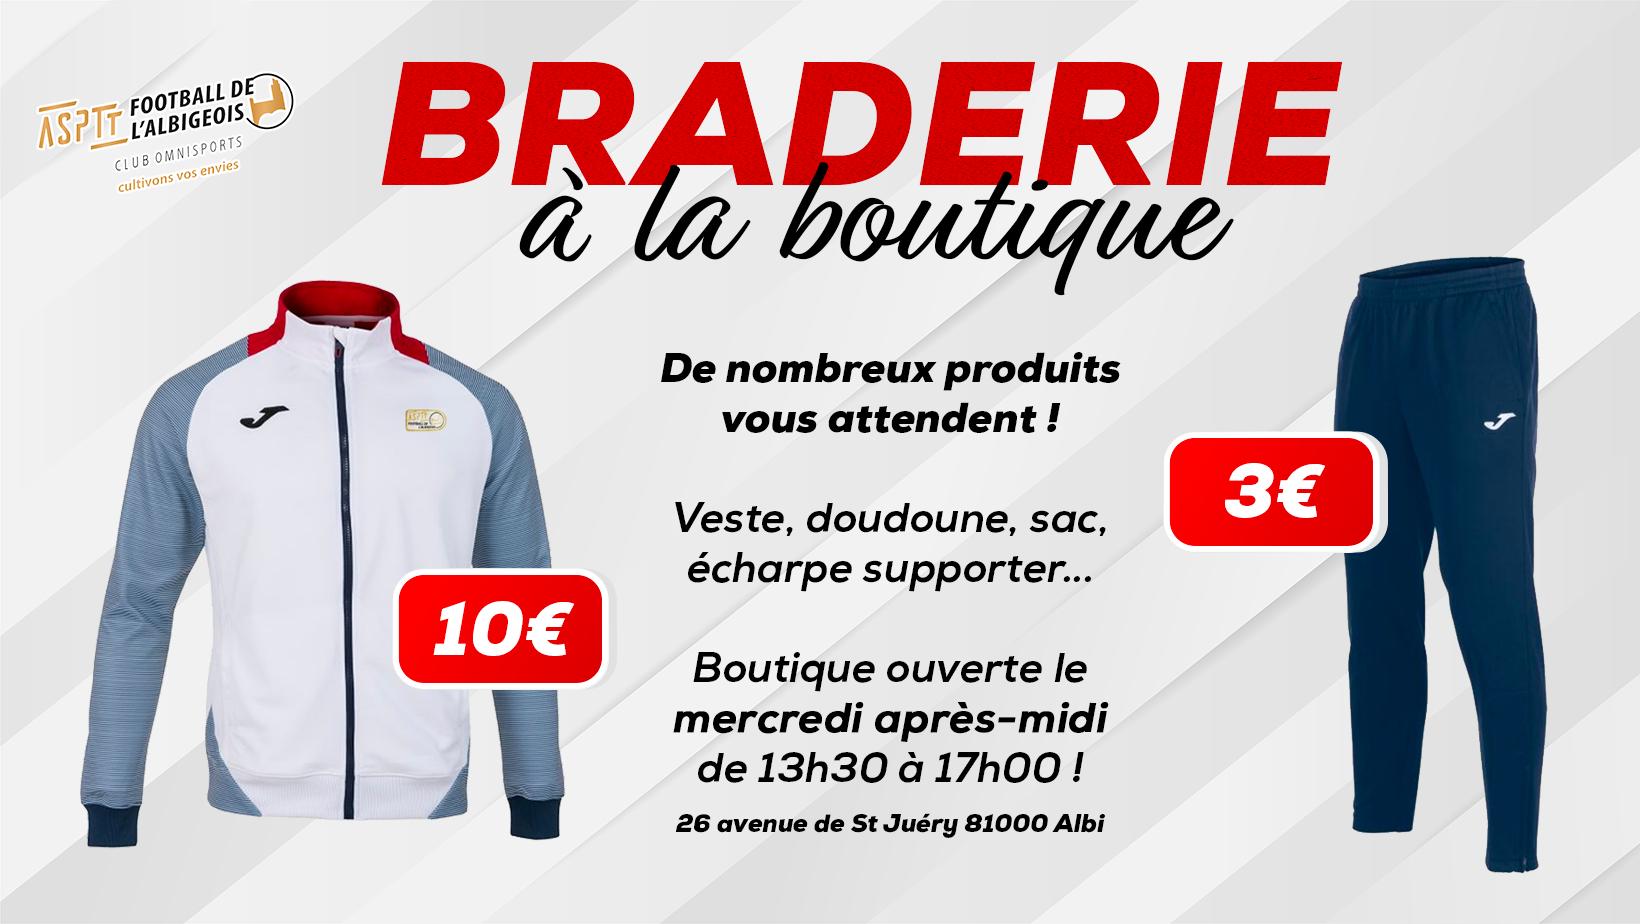 Braderie Boutique